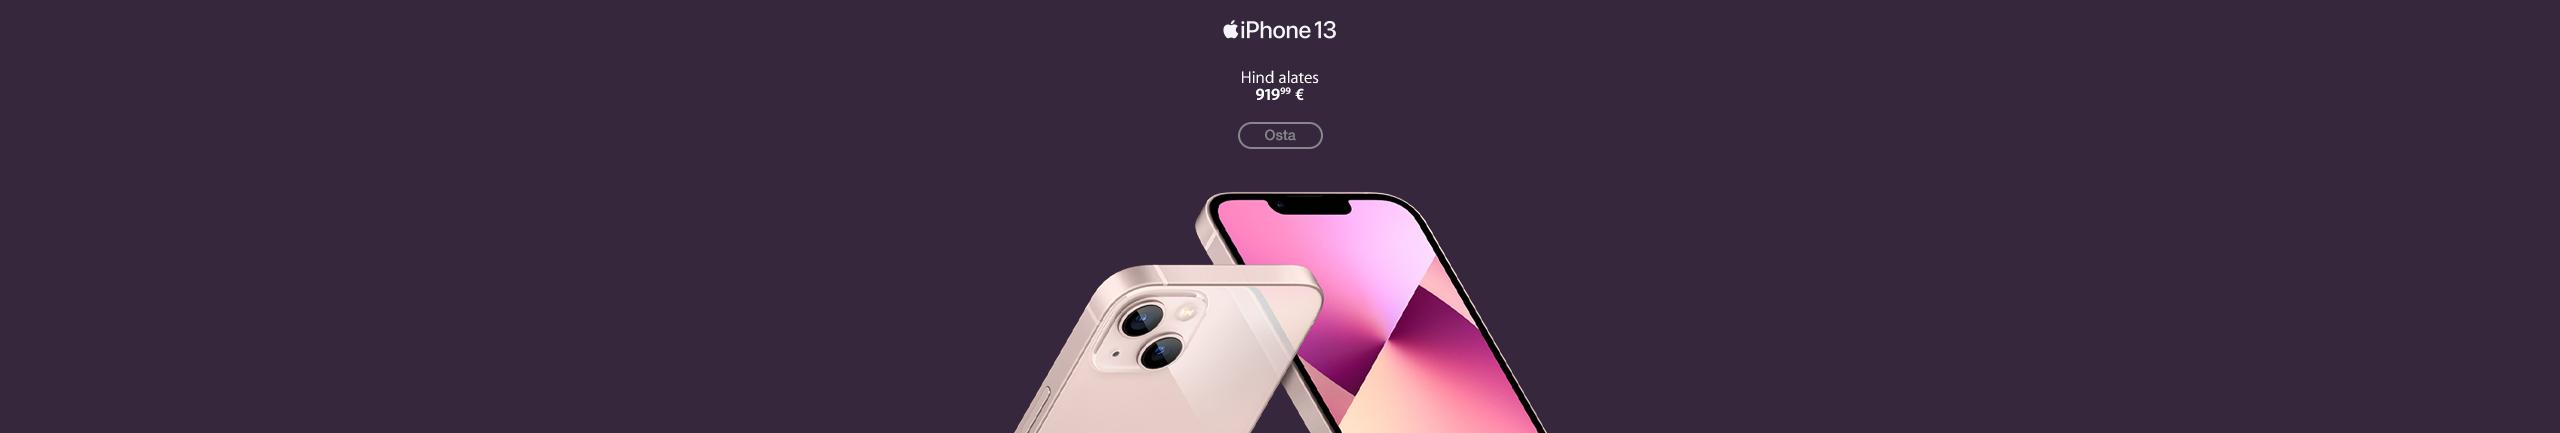 NPL Osta Apple iPhone 13